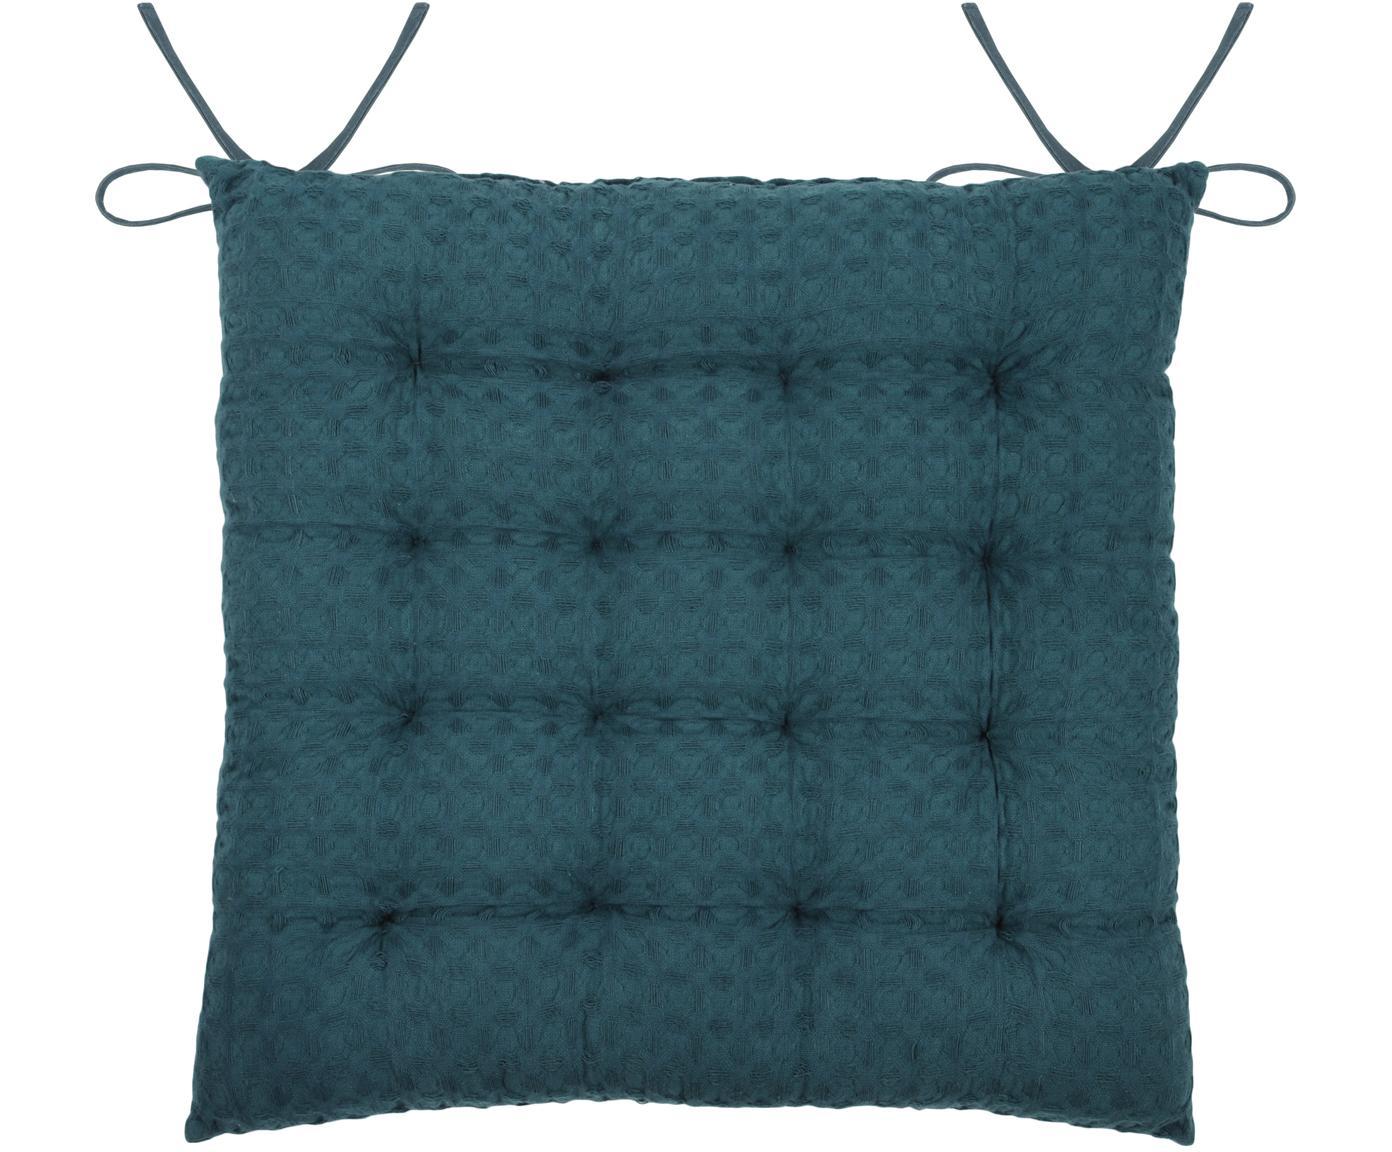 Cuscino sedia Gopher, Rivestimento: cotone, Blu petrolio, Larg. 40 x Lung. 40 cm